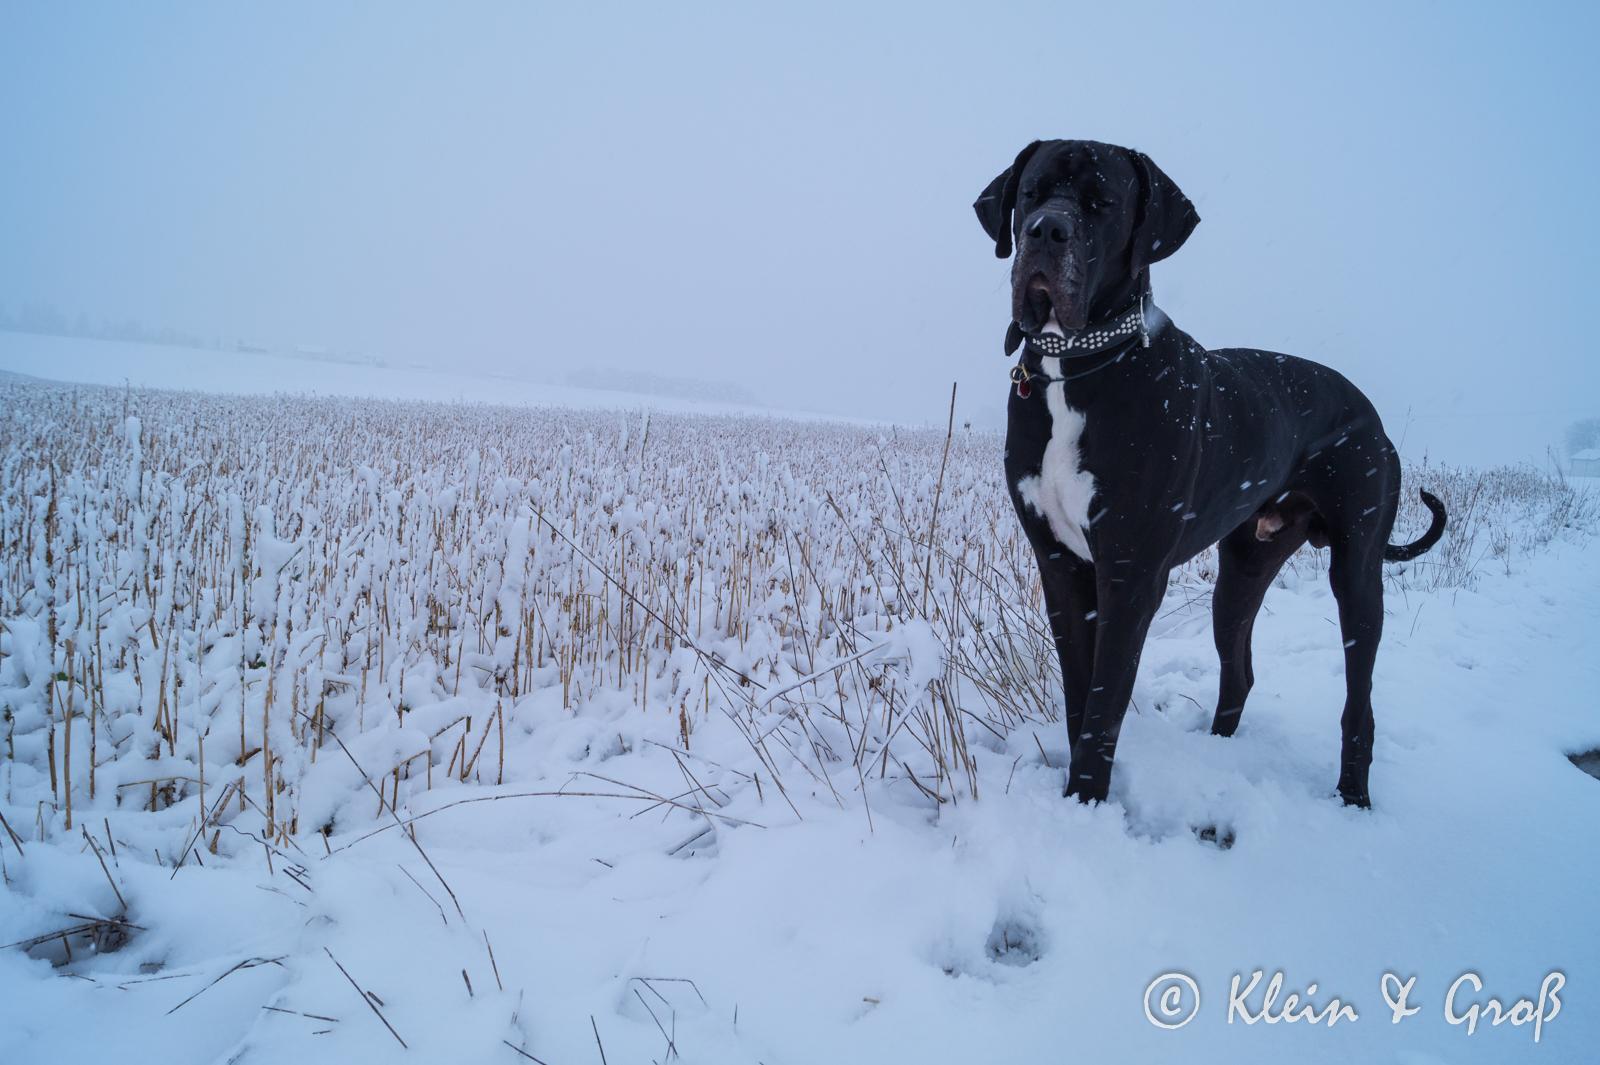 Dogge Schnee Hundeblog miDoggy